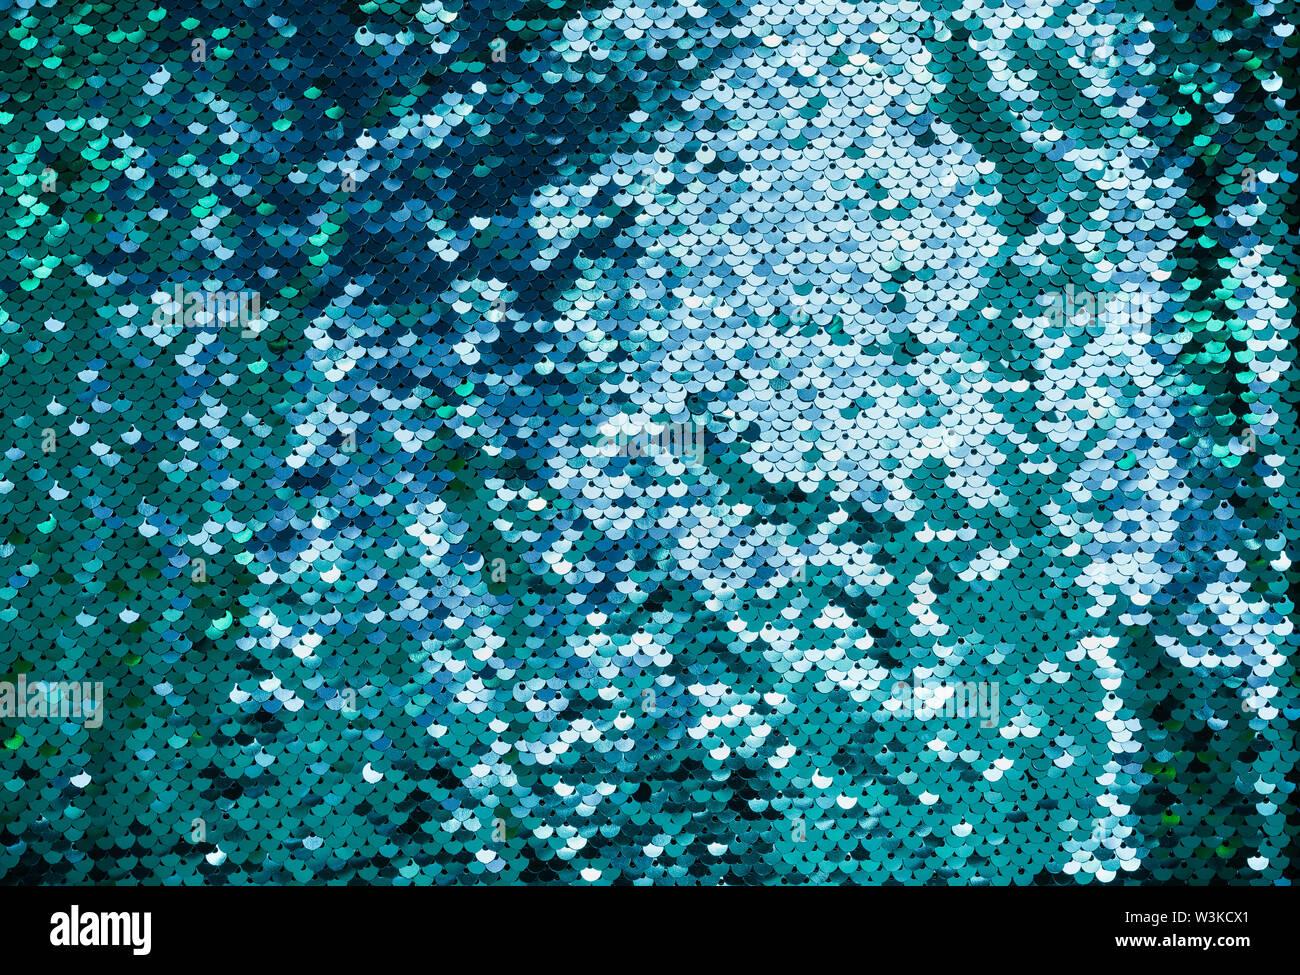 Shiny background made of turquoise sequins. Luxury scaly Background. - Stock Image